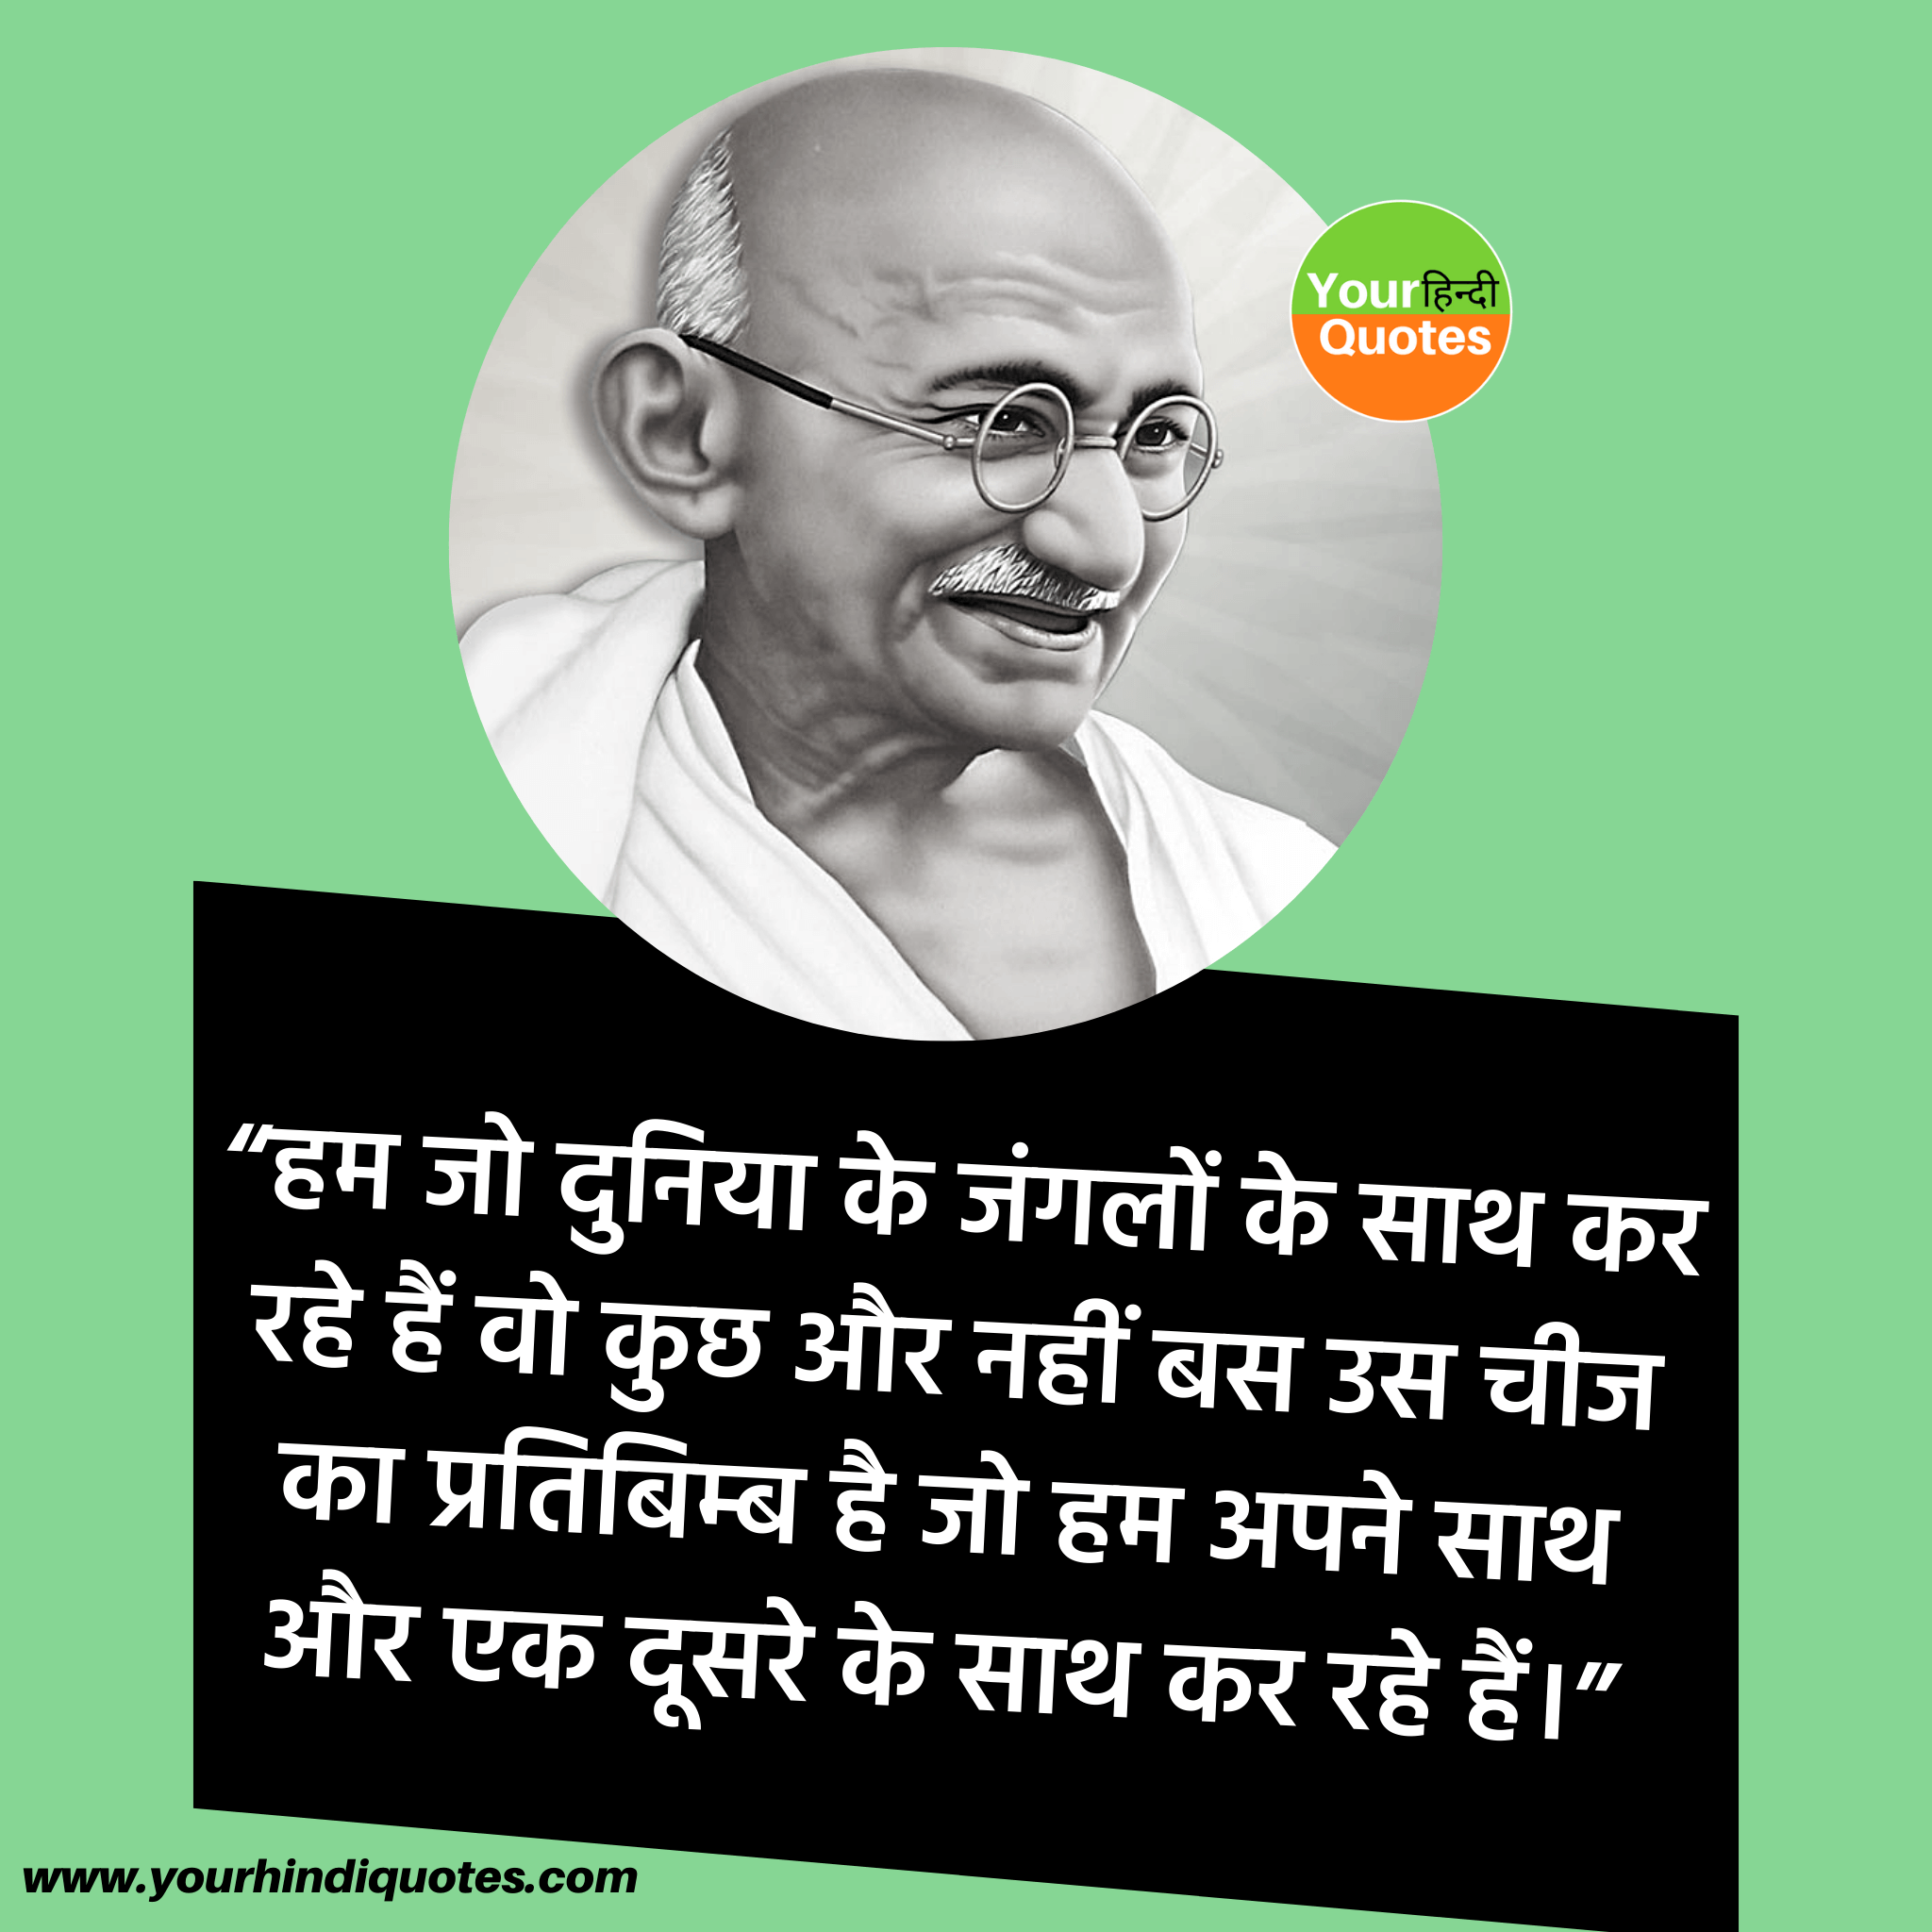 Mahatma Gandhi Hindi Quotes Images